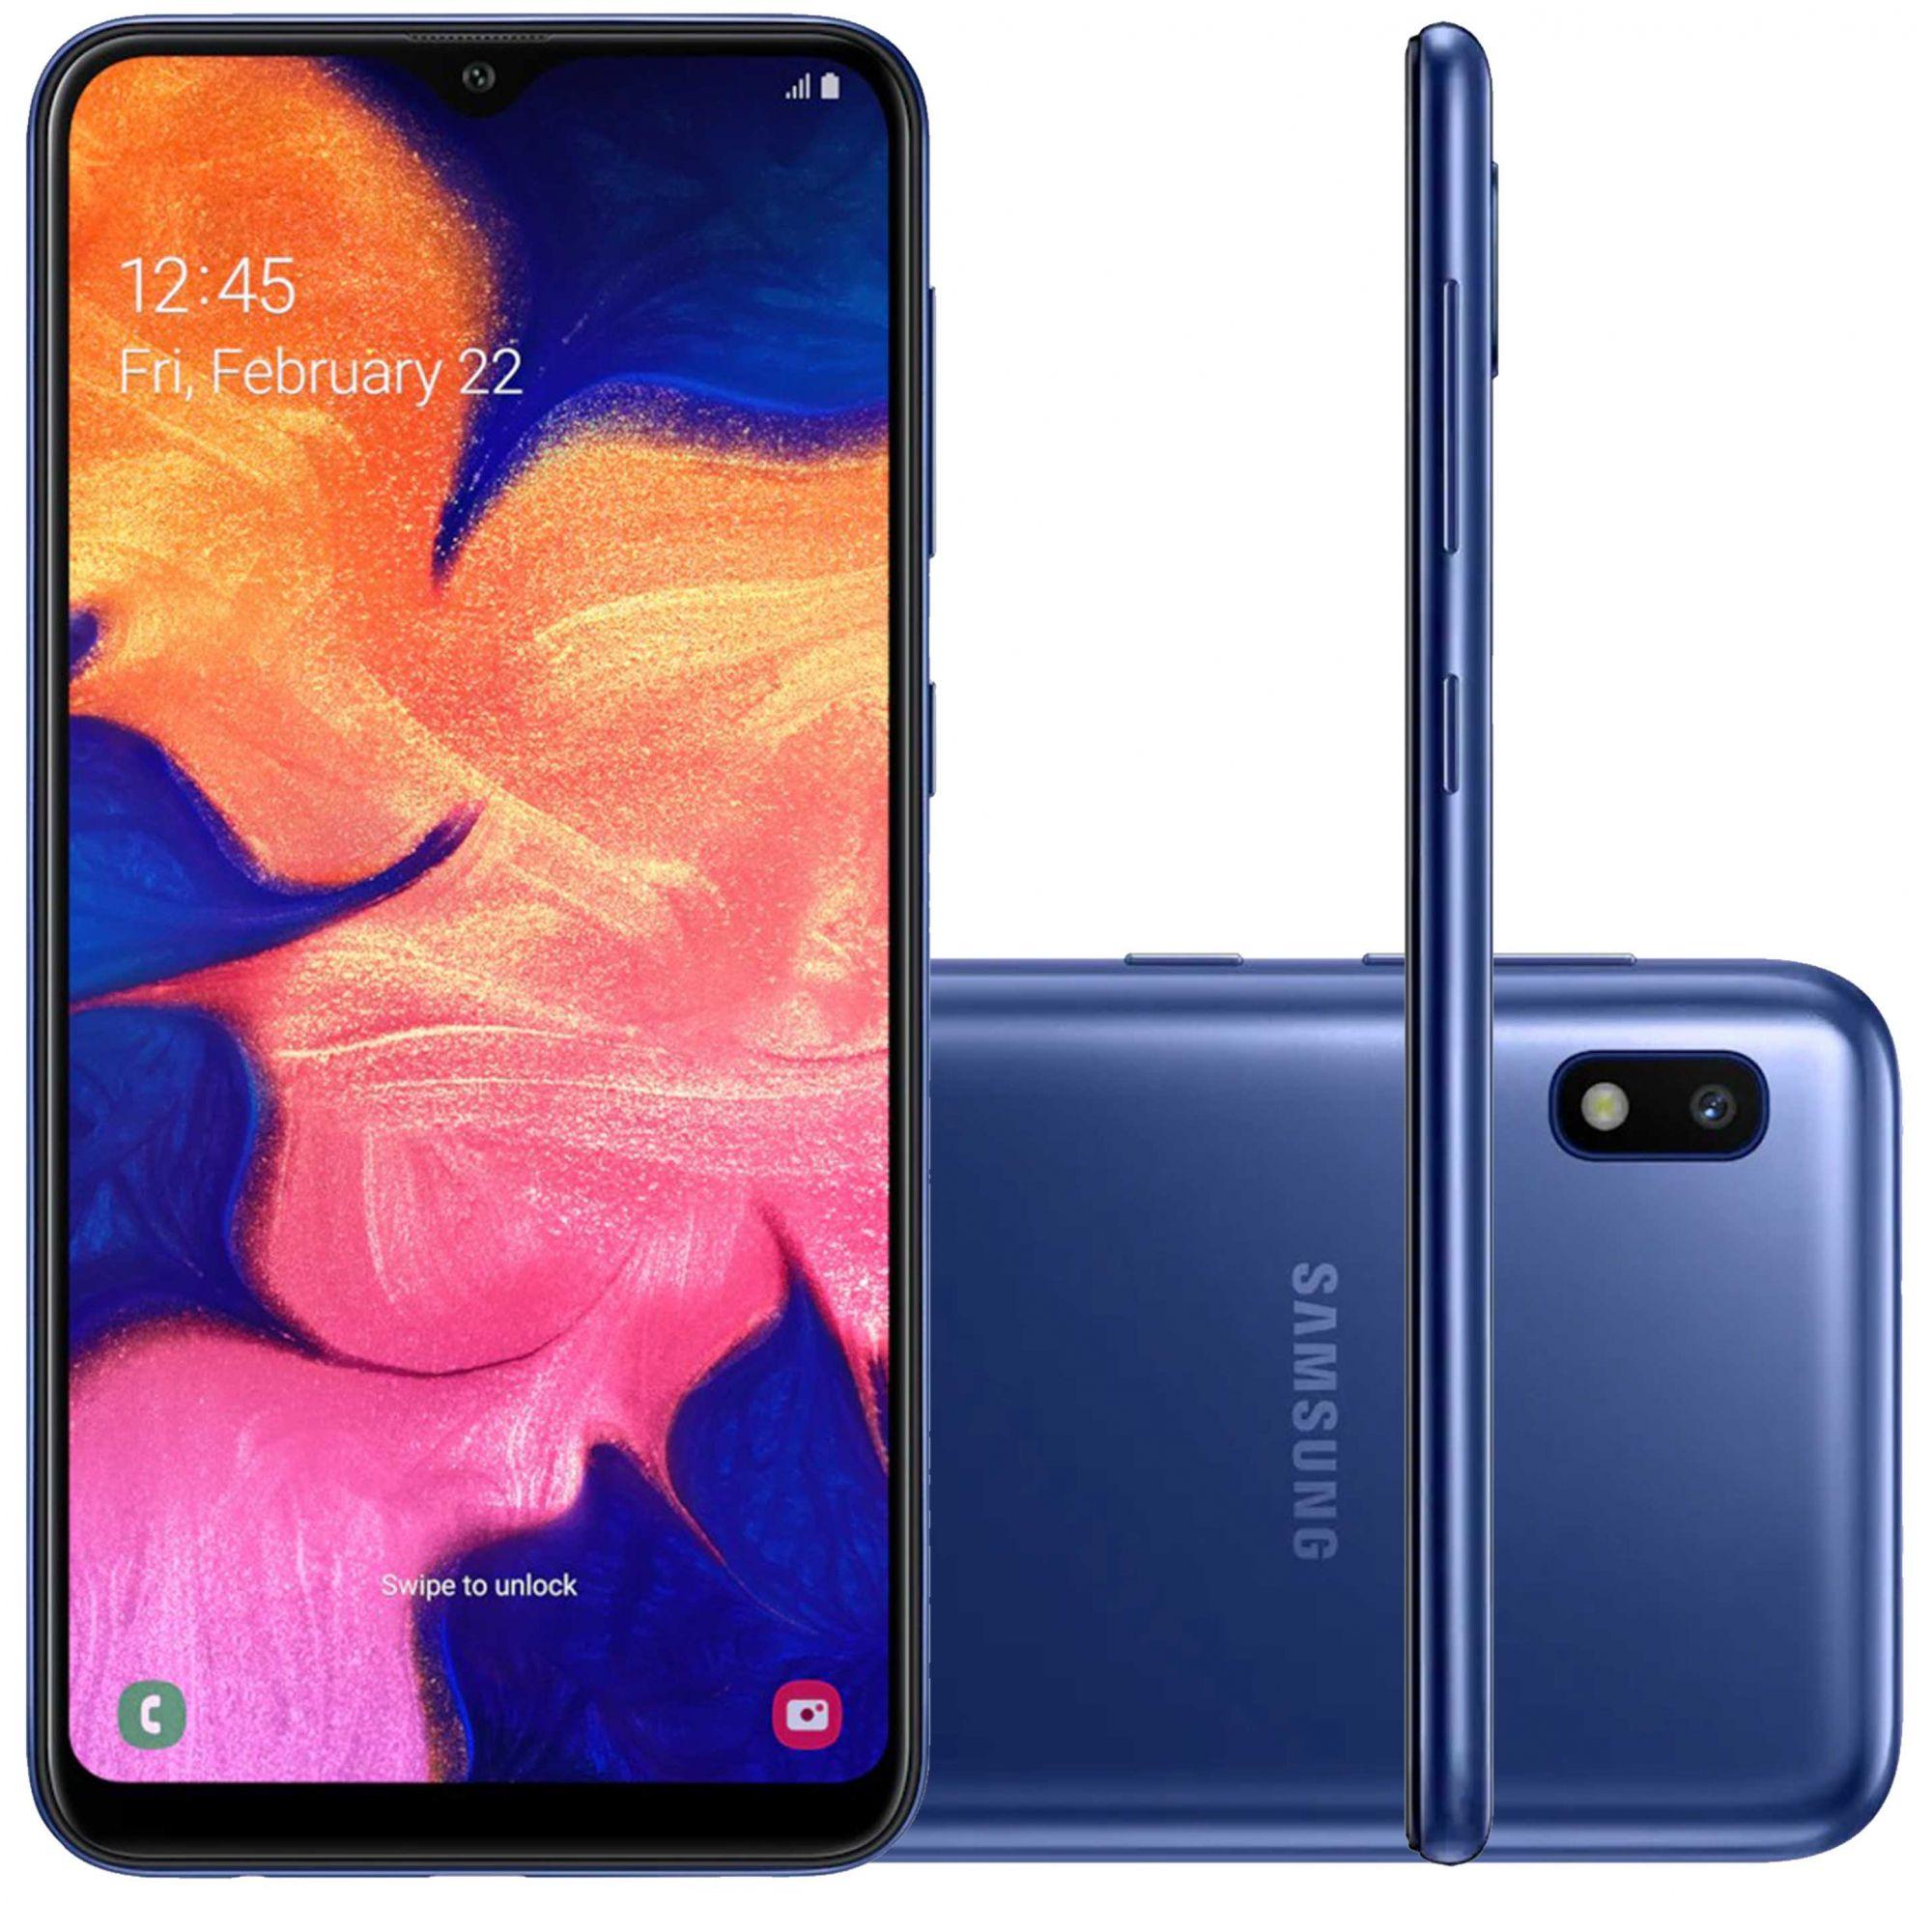 "Smartphone Samsung Galaxy A10 32GB Dual Chip Android 9.0 Tela 6.2"" Octa-Core 4G Câmera 13MP - Azul"